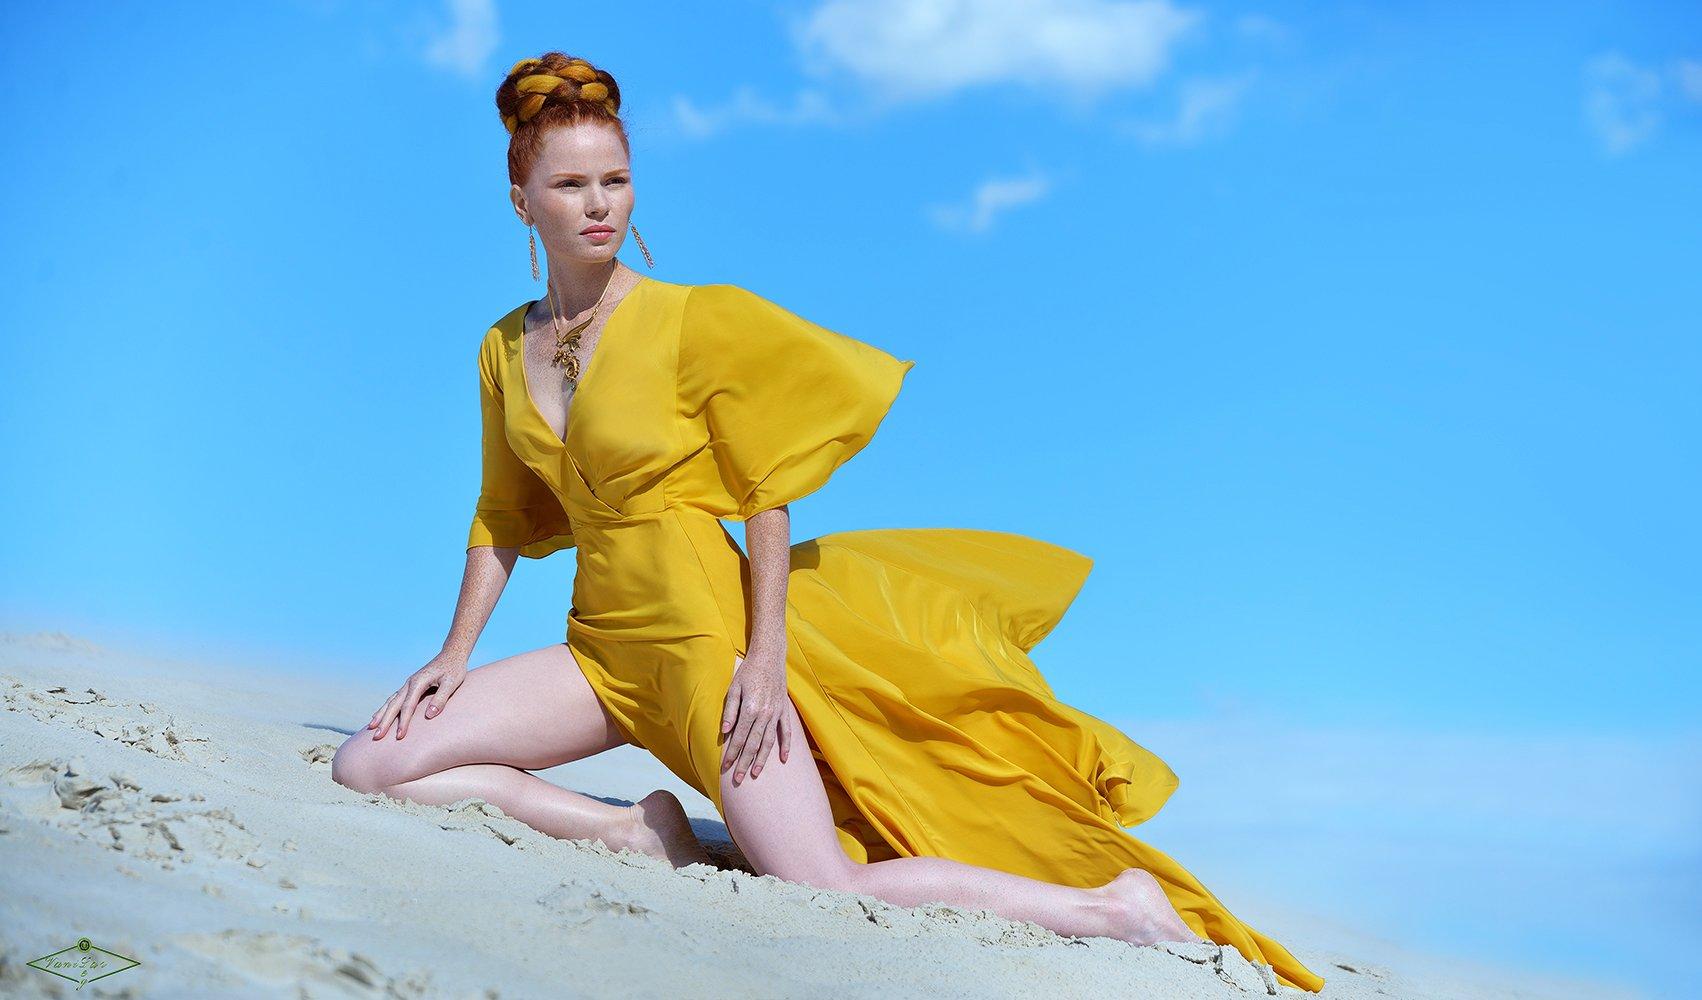 fashion, girl, beauty, девушка, природа, песок, красота, мода, Олег Ванилар